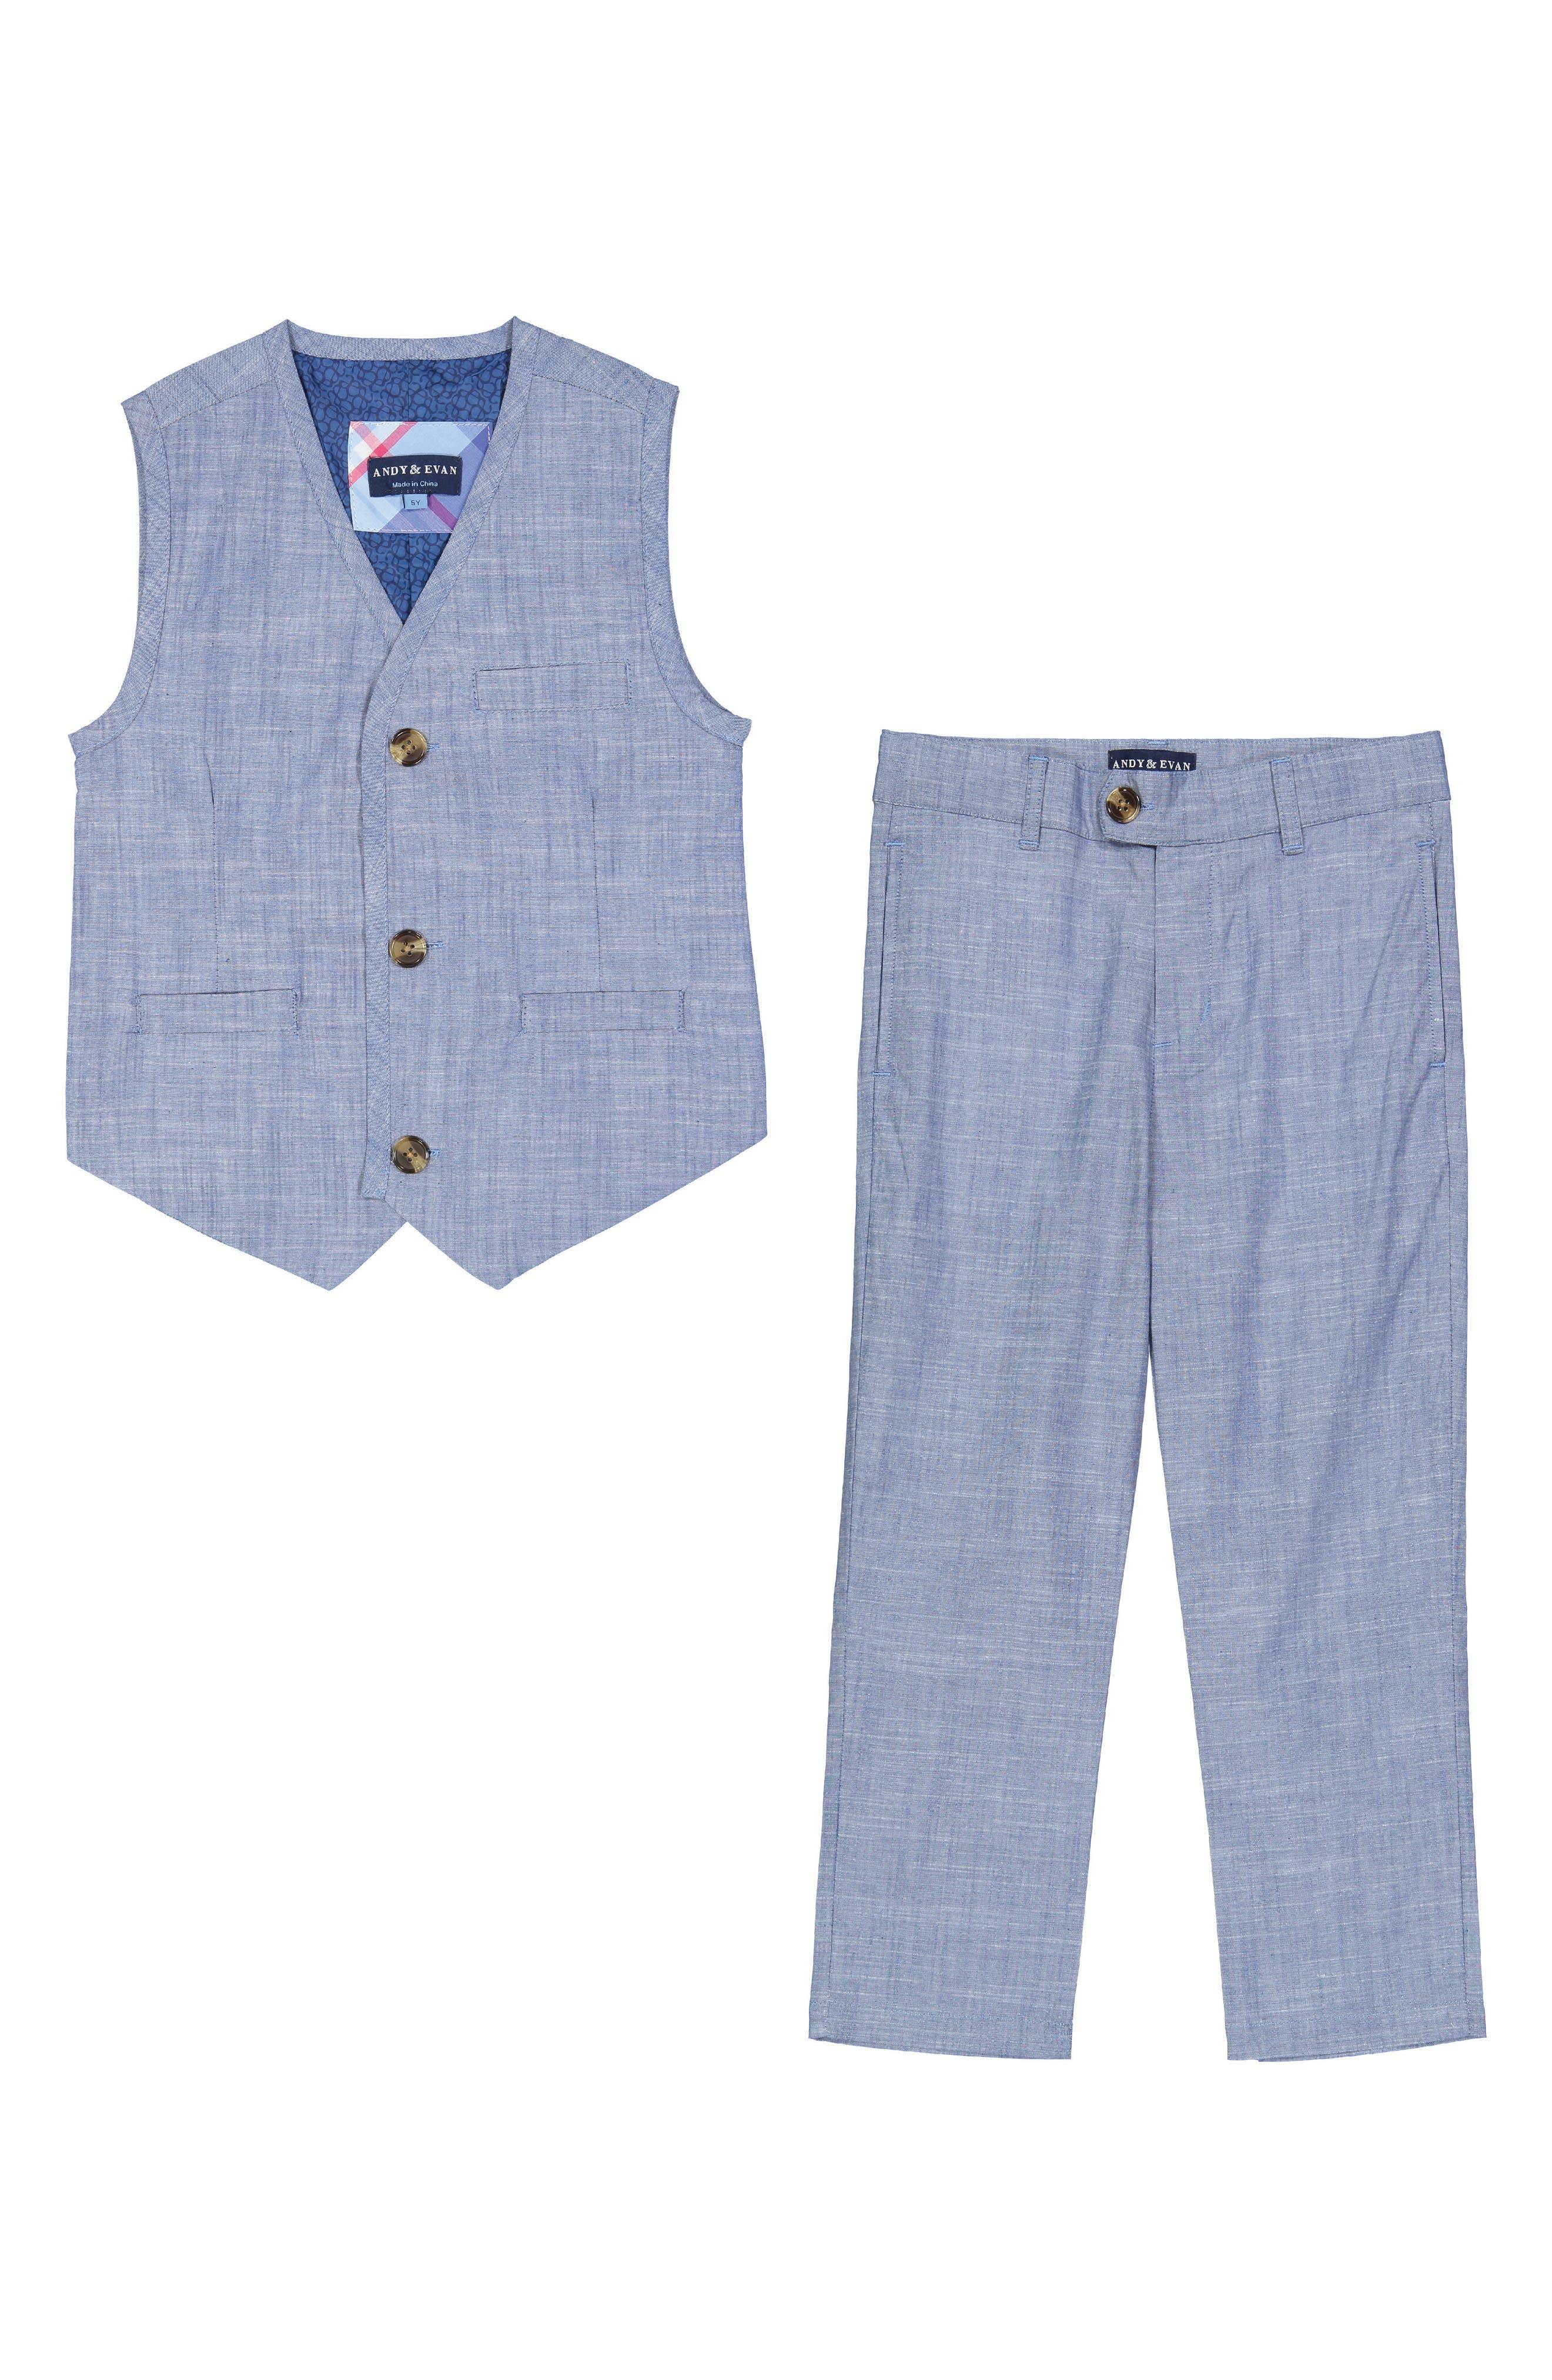 Chambray Vest & Pants Set,                             Main thumbnail 1, color,                             Blue